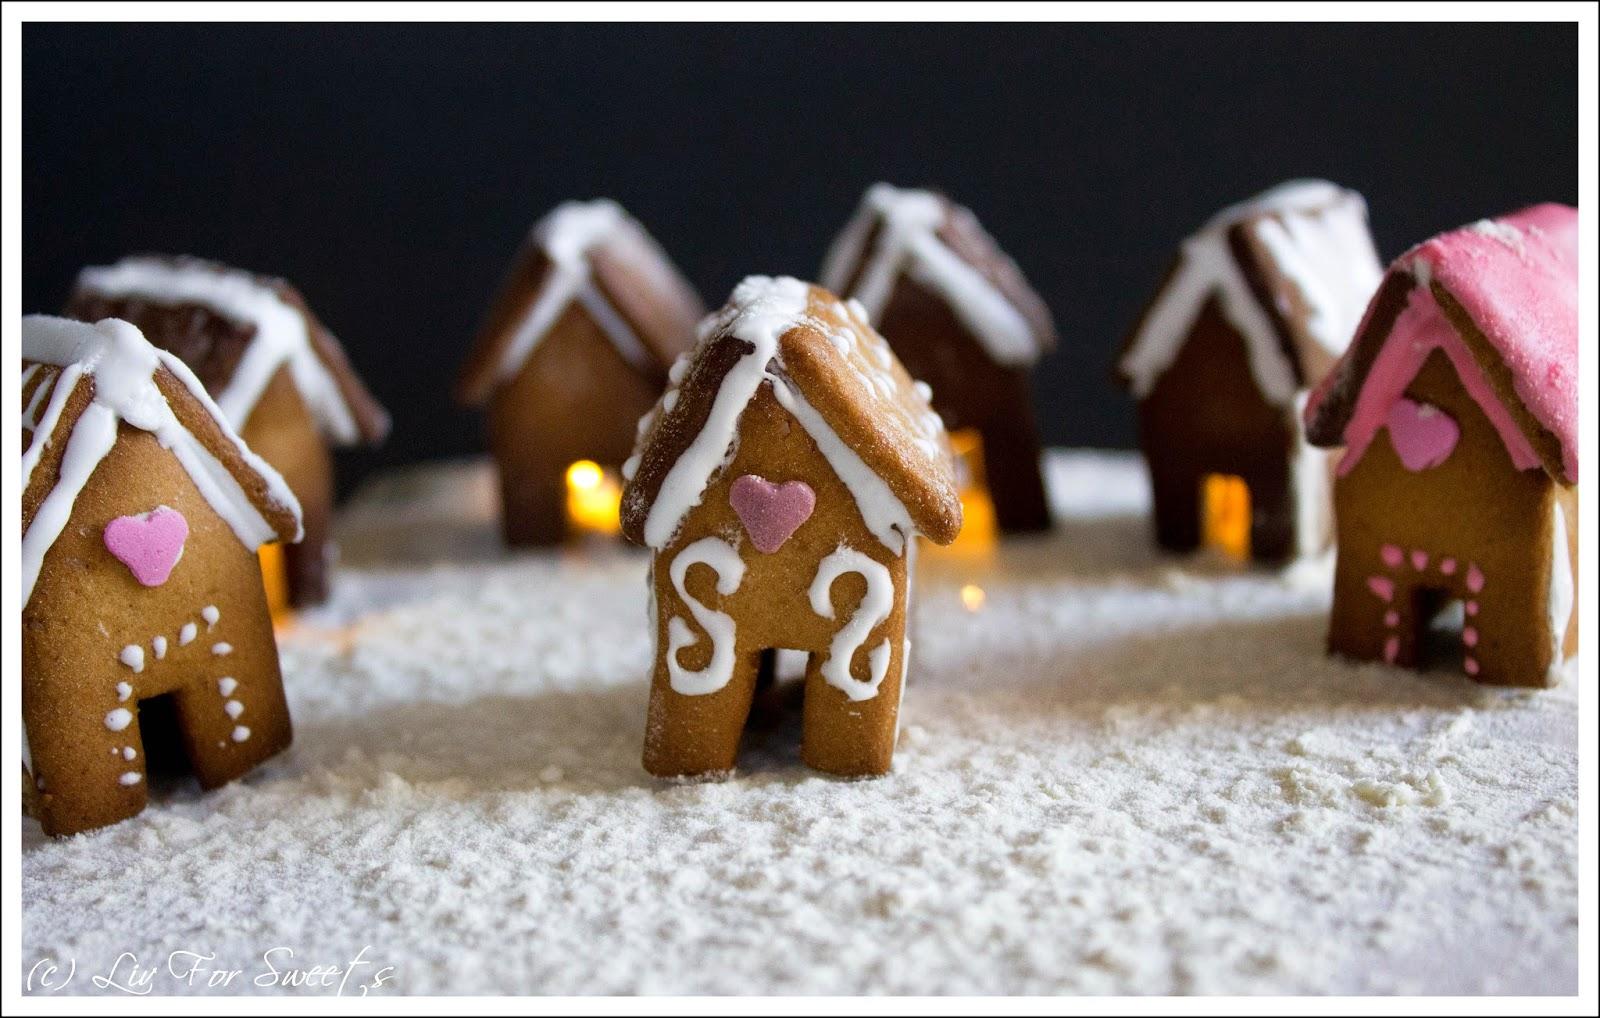 Lebkuchenhaus, Lebkuchendorf, Gingerland, Rezept, Thermomix, Weihnachten, Tassenkeks